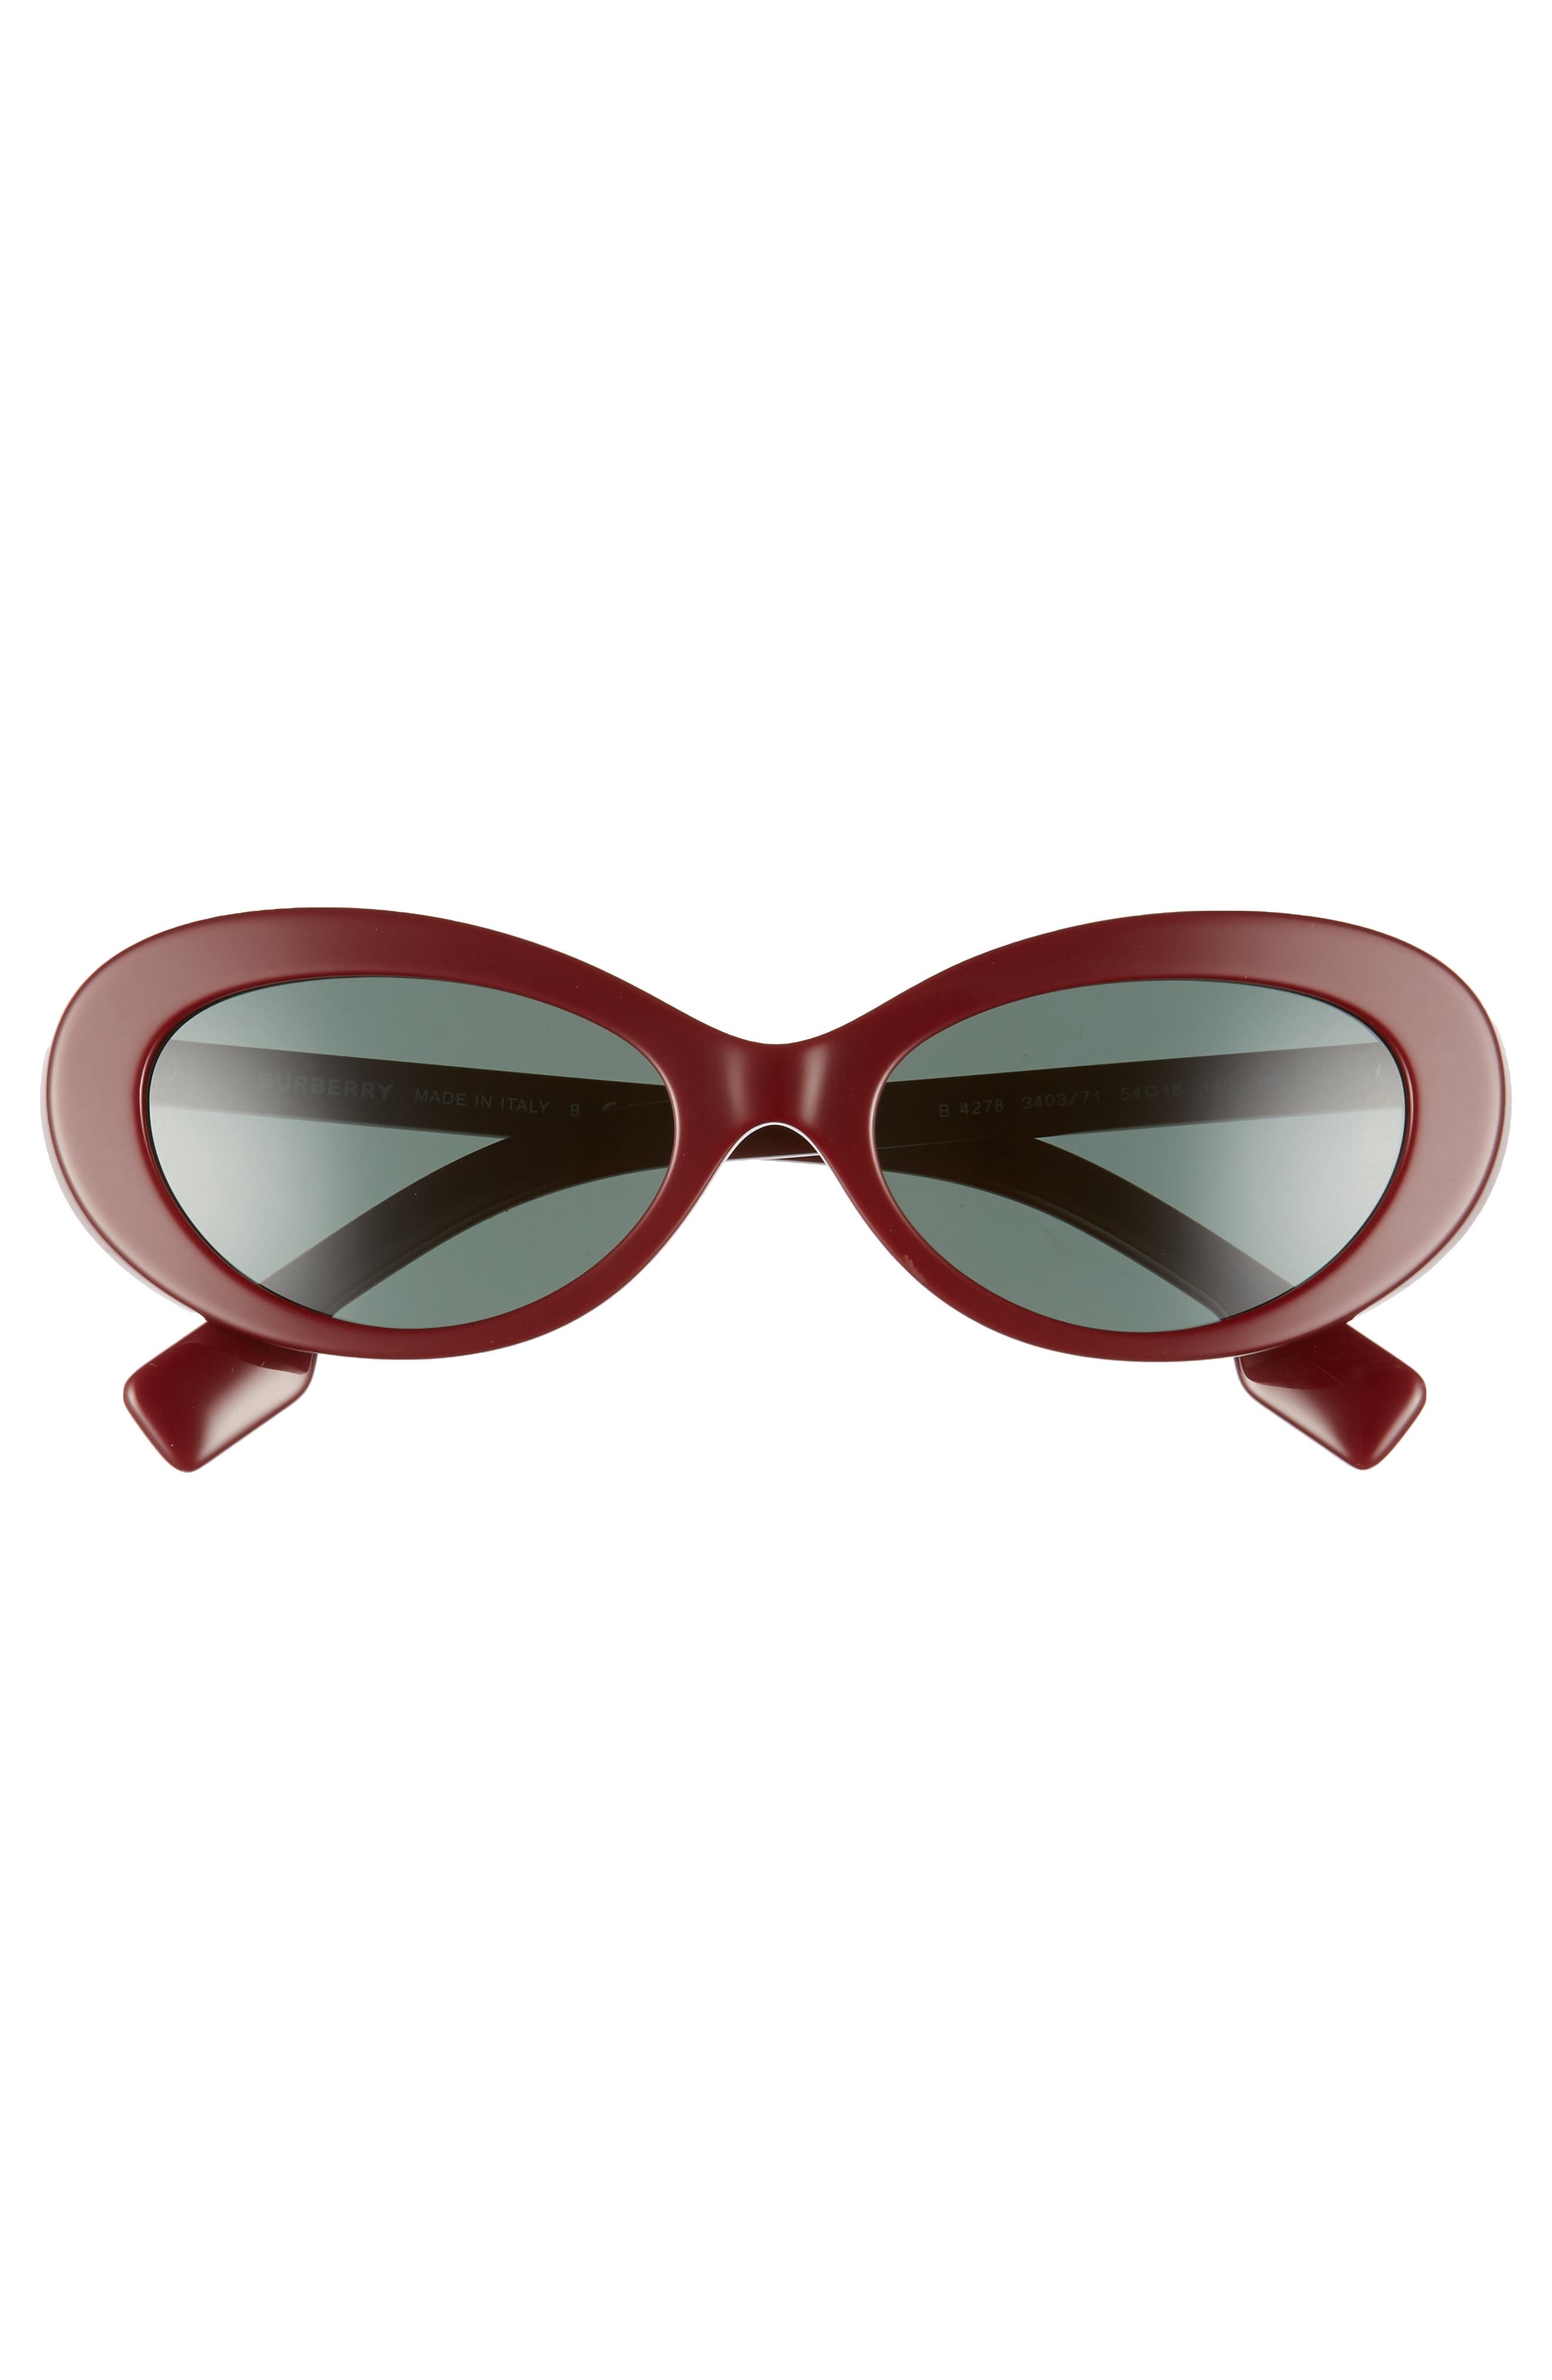 54mm Oval Sunglasses,                             Alternate thumbnail 3, color,                             BORDEAUX SOLID